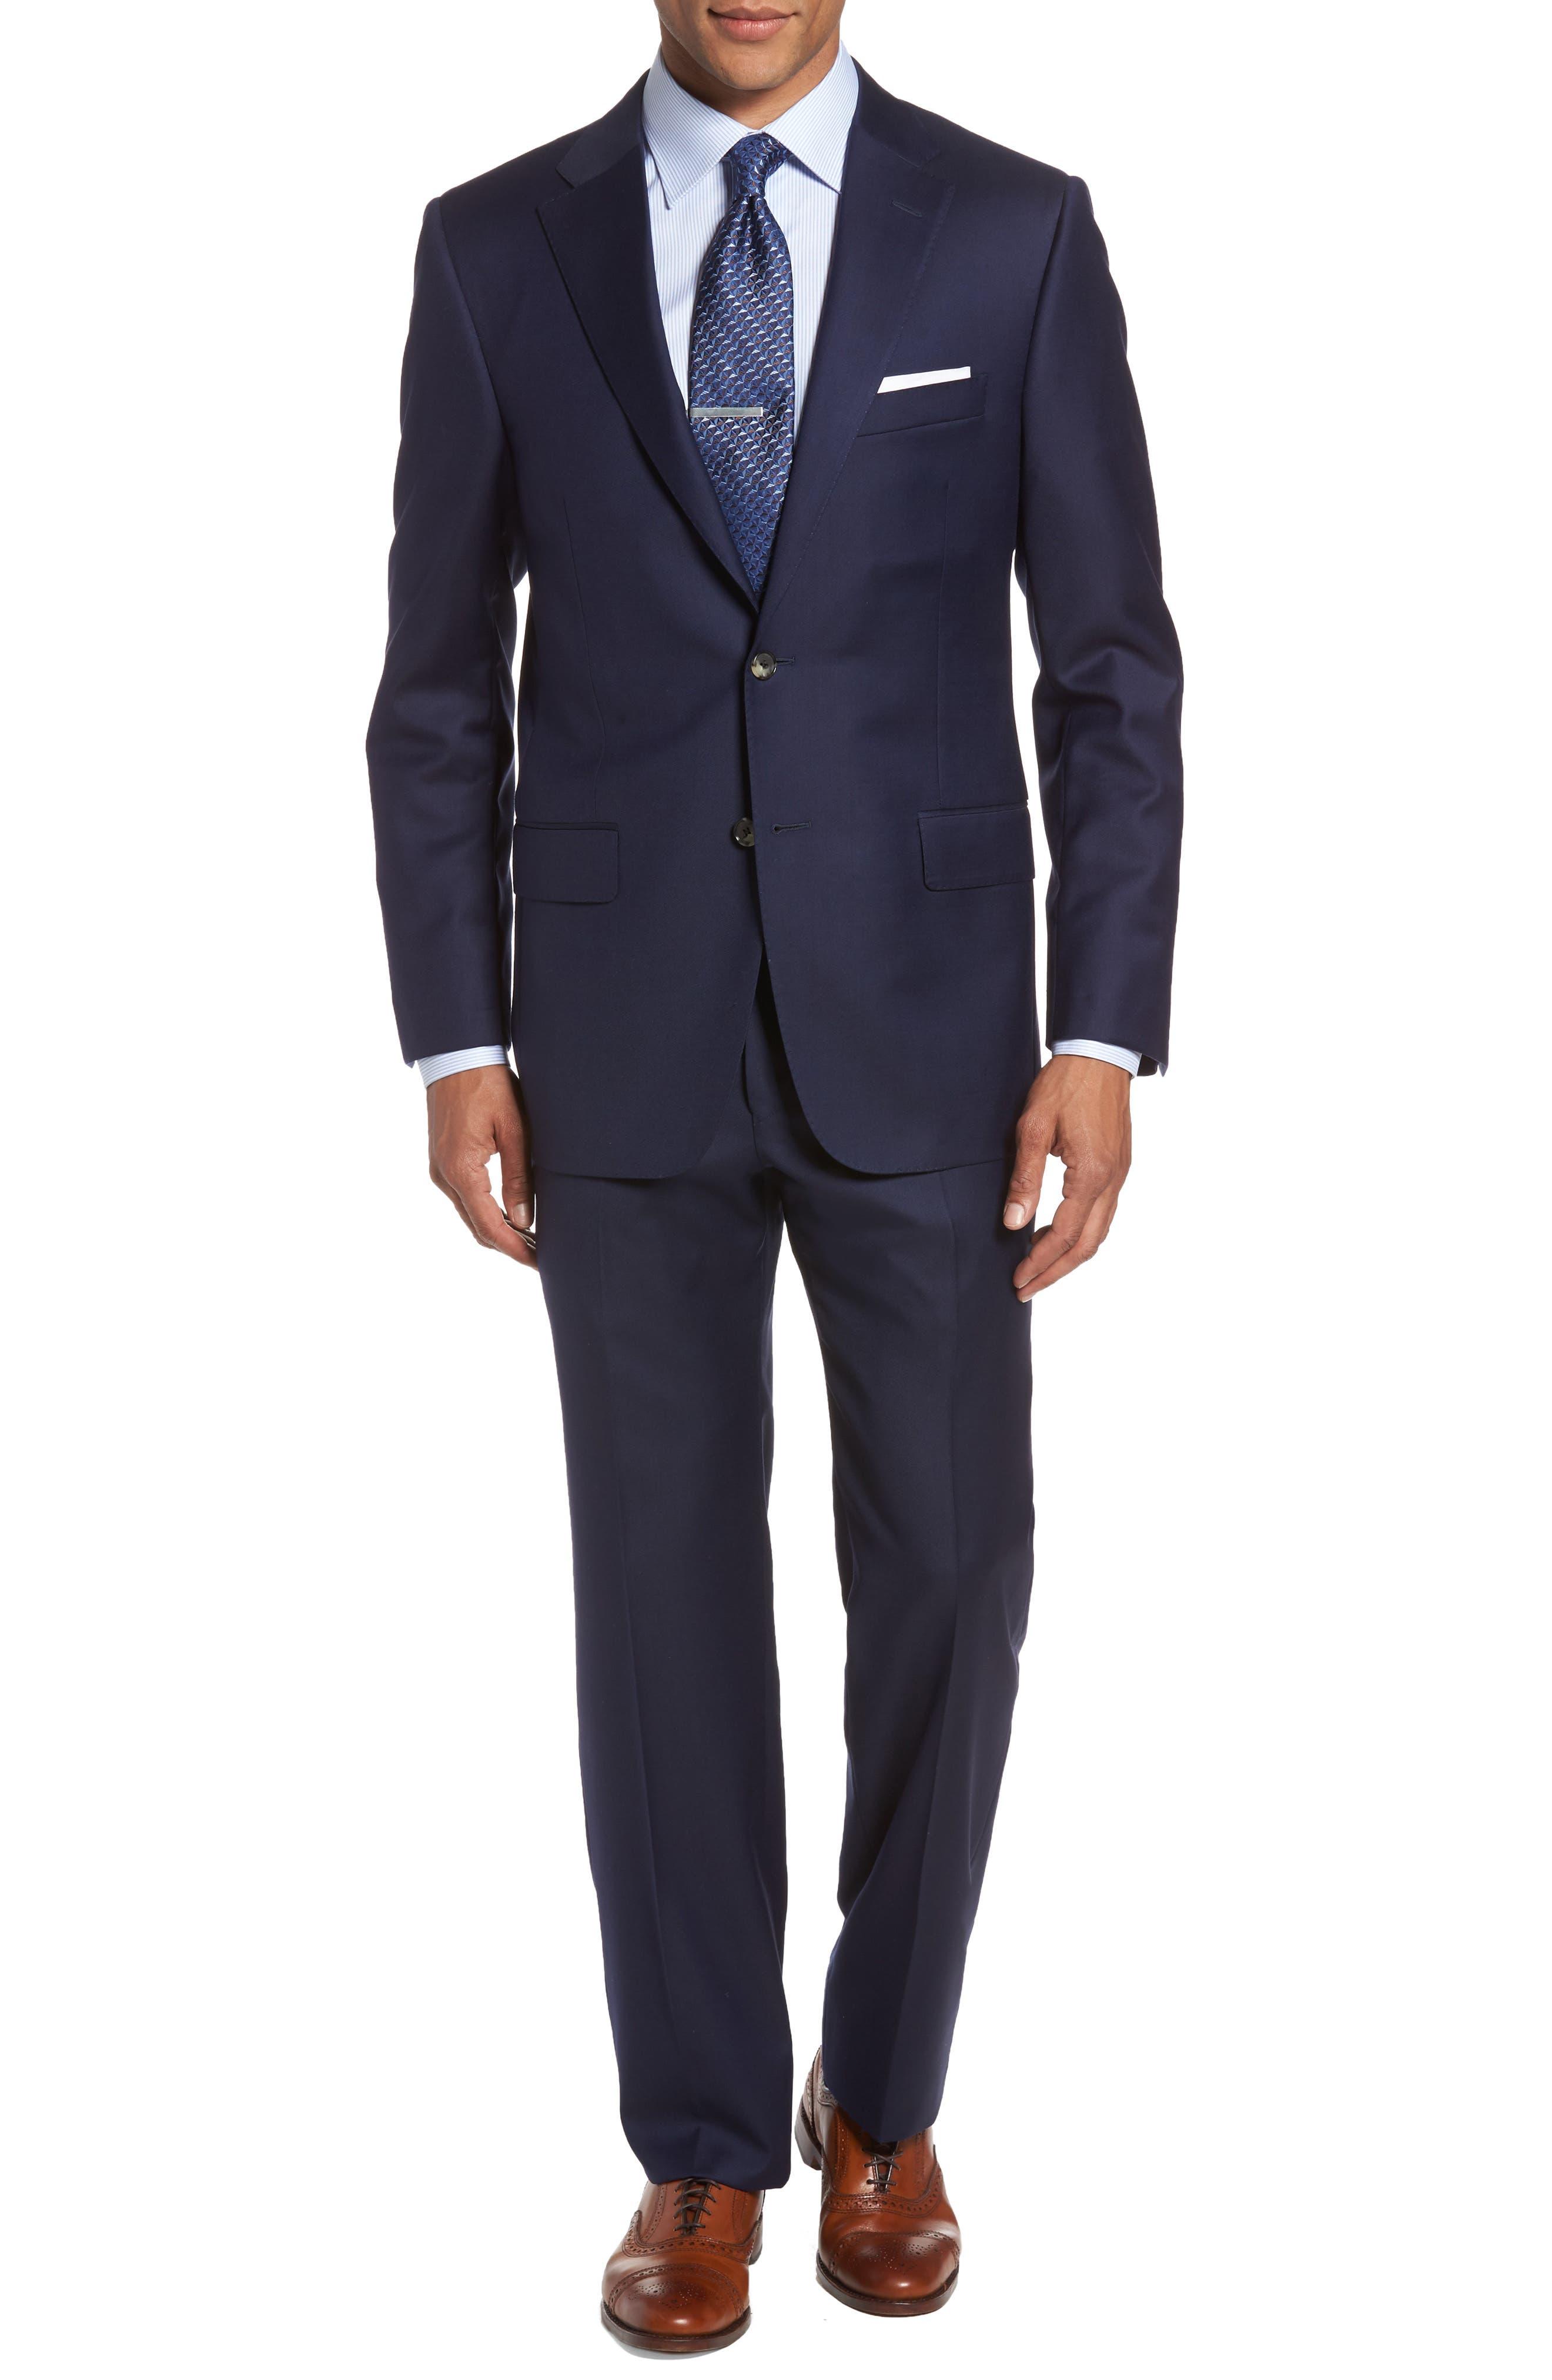 HICKEY FREEMAN, Classic B Fit Loro Piana Wool Suit, Main thumbnail 1, color, NAVY